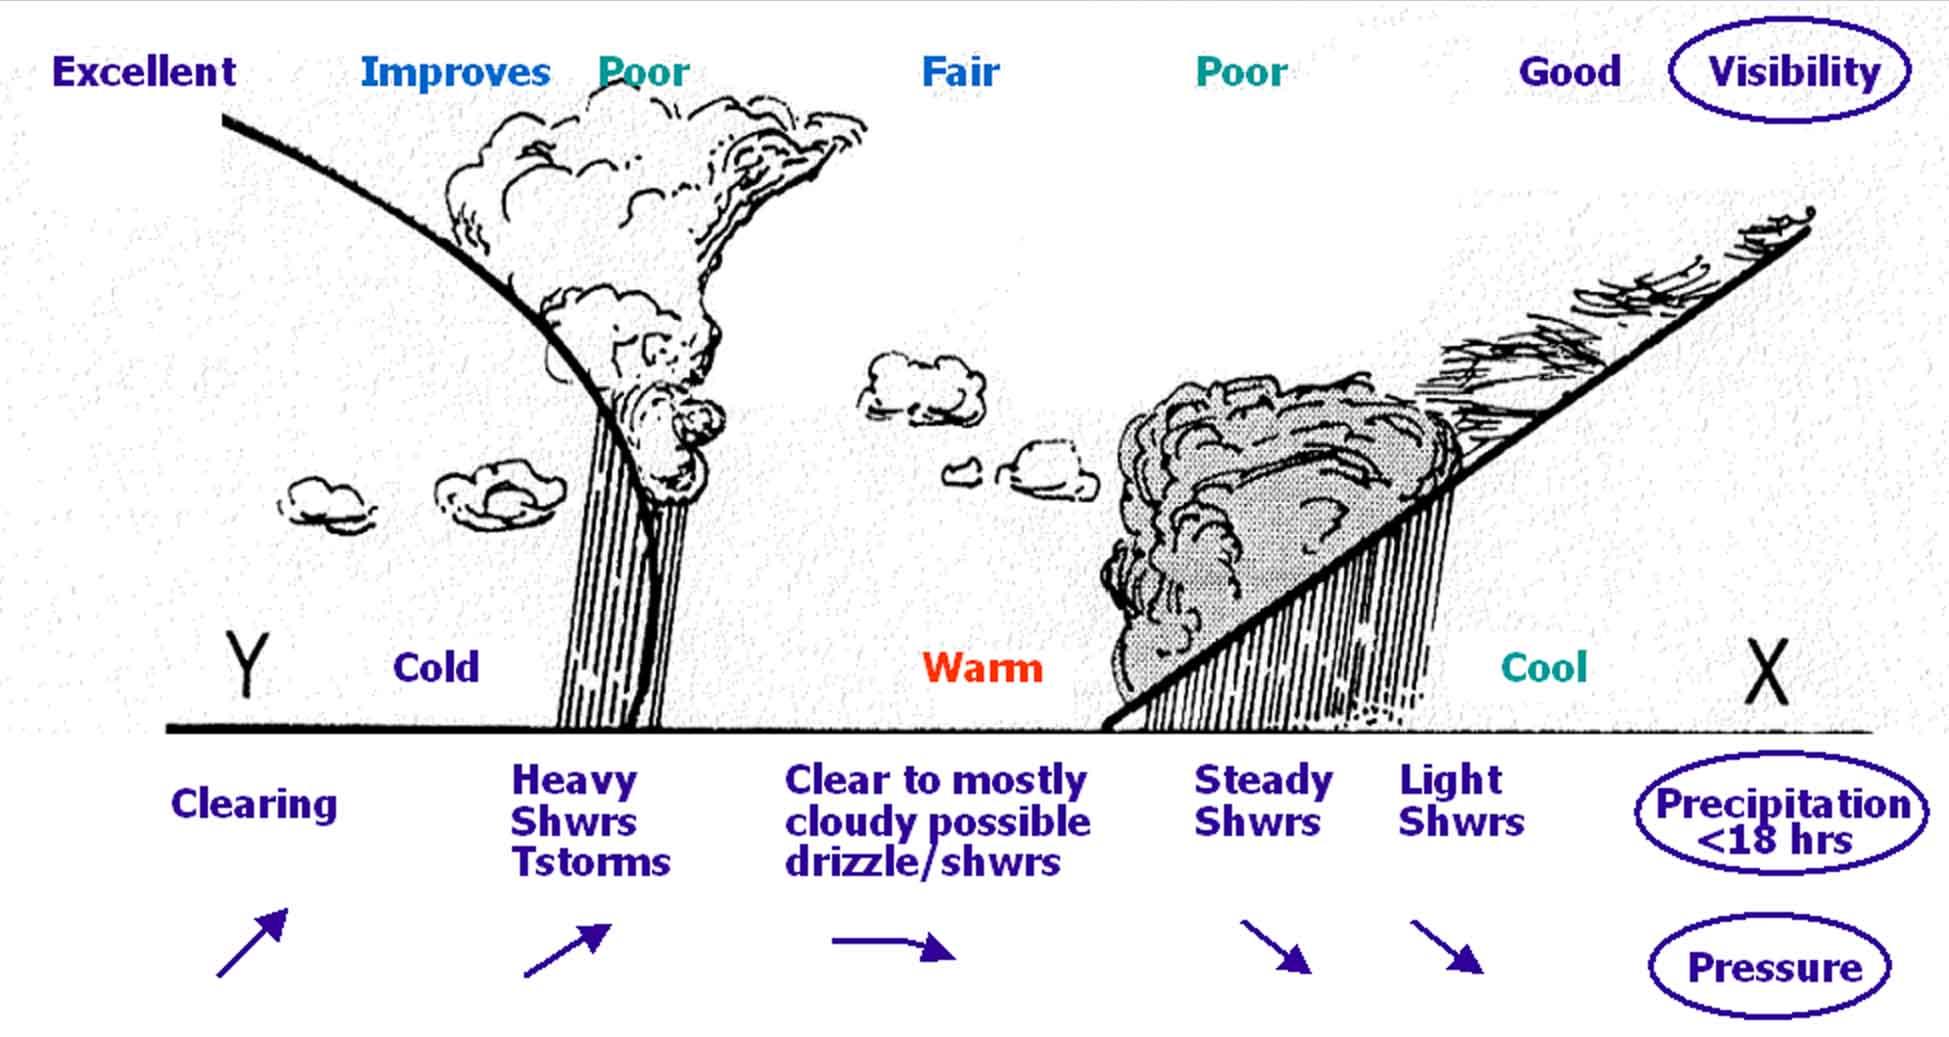 worksheet Weather Fronts Worksheet weather fronts worksheet abitlikethis warm and cold front worksheets httpwww usps orgnational